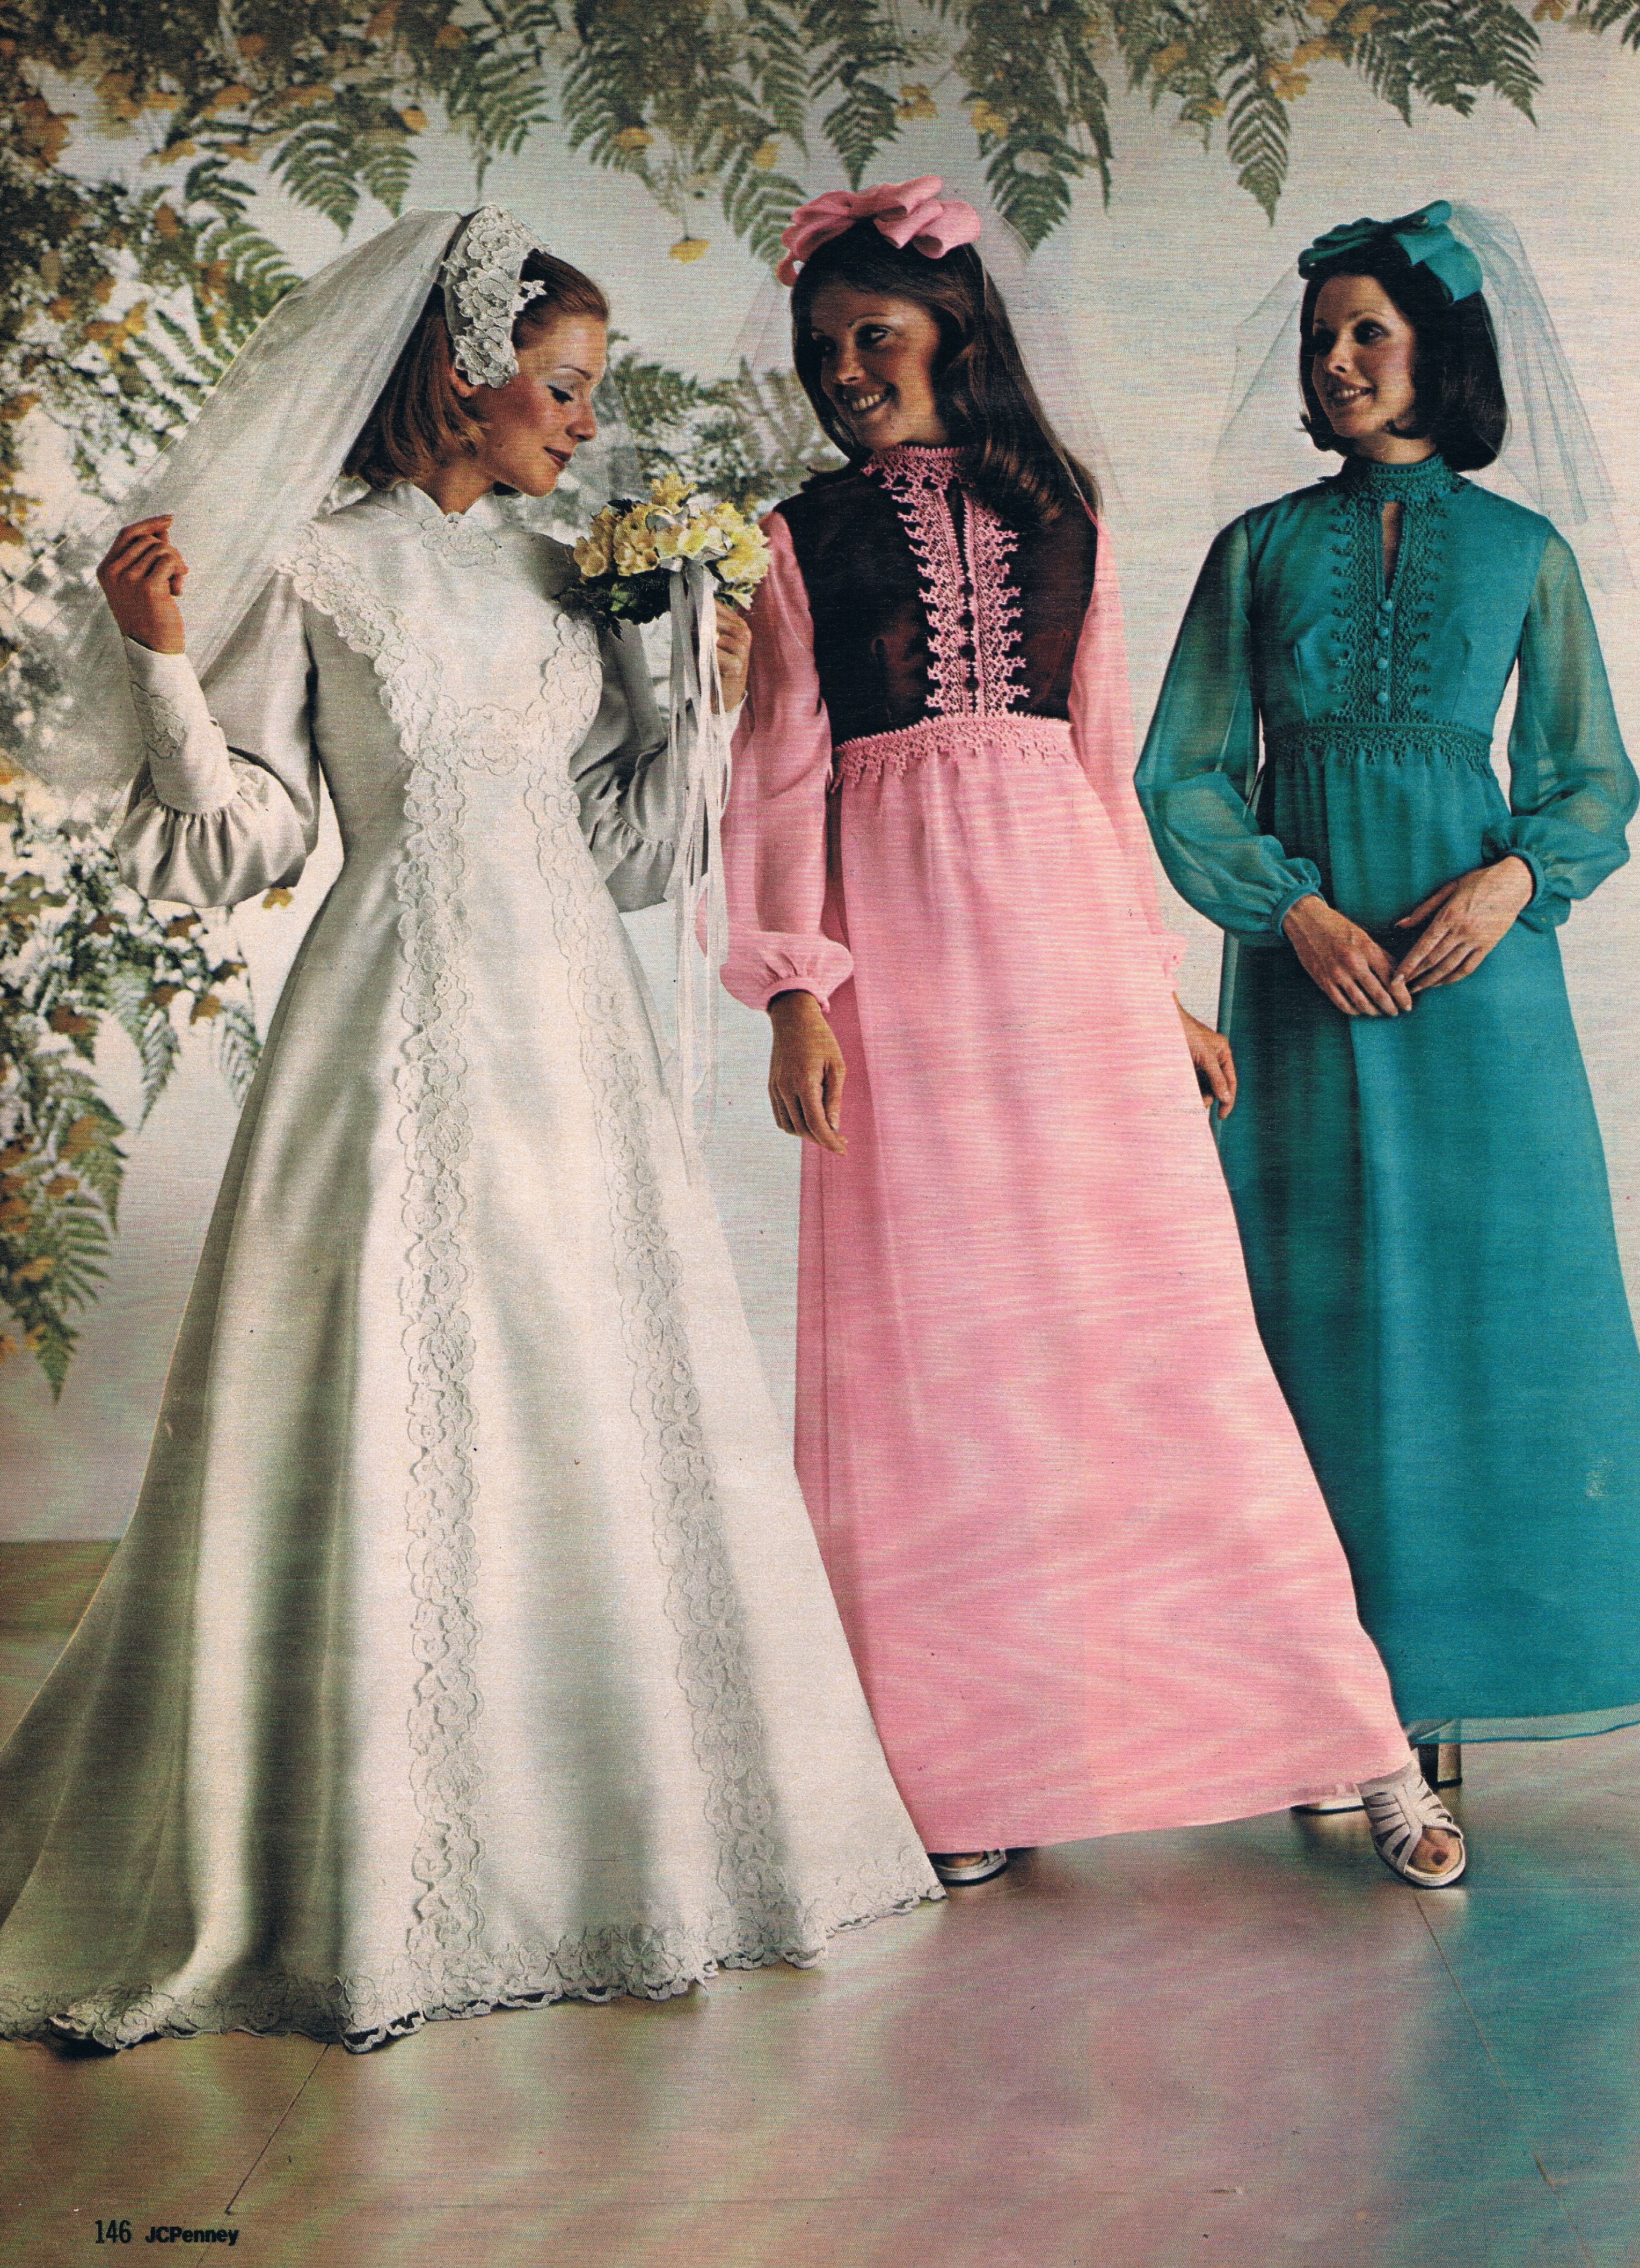 Penneys catalog 70s | Vintage/retro wedding | Pinterest | Novias ...